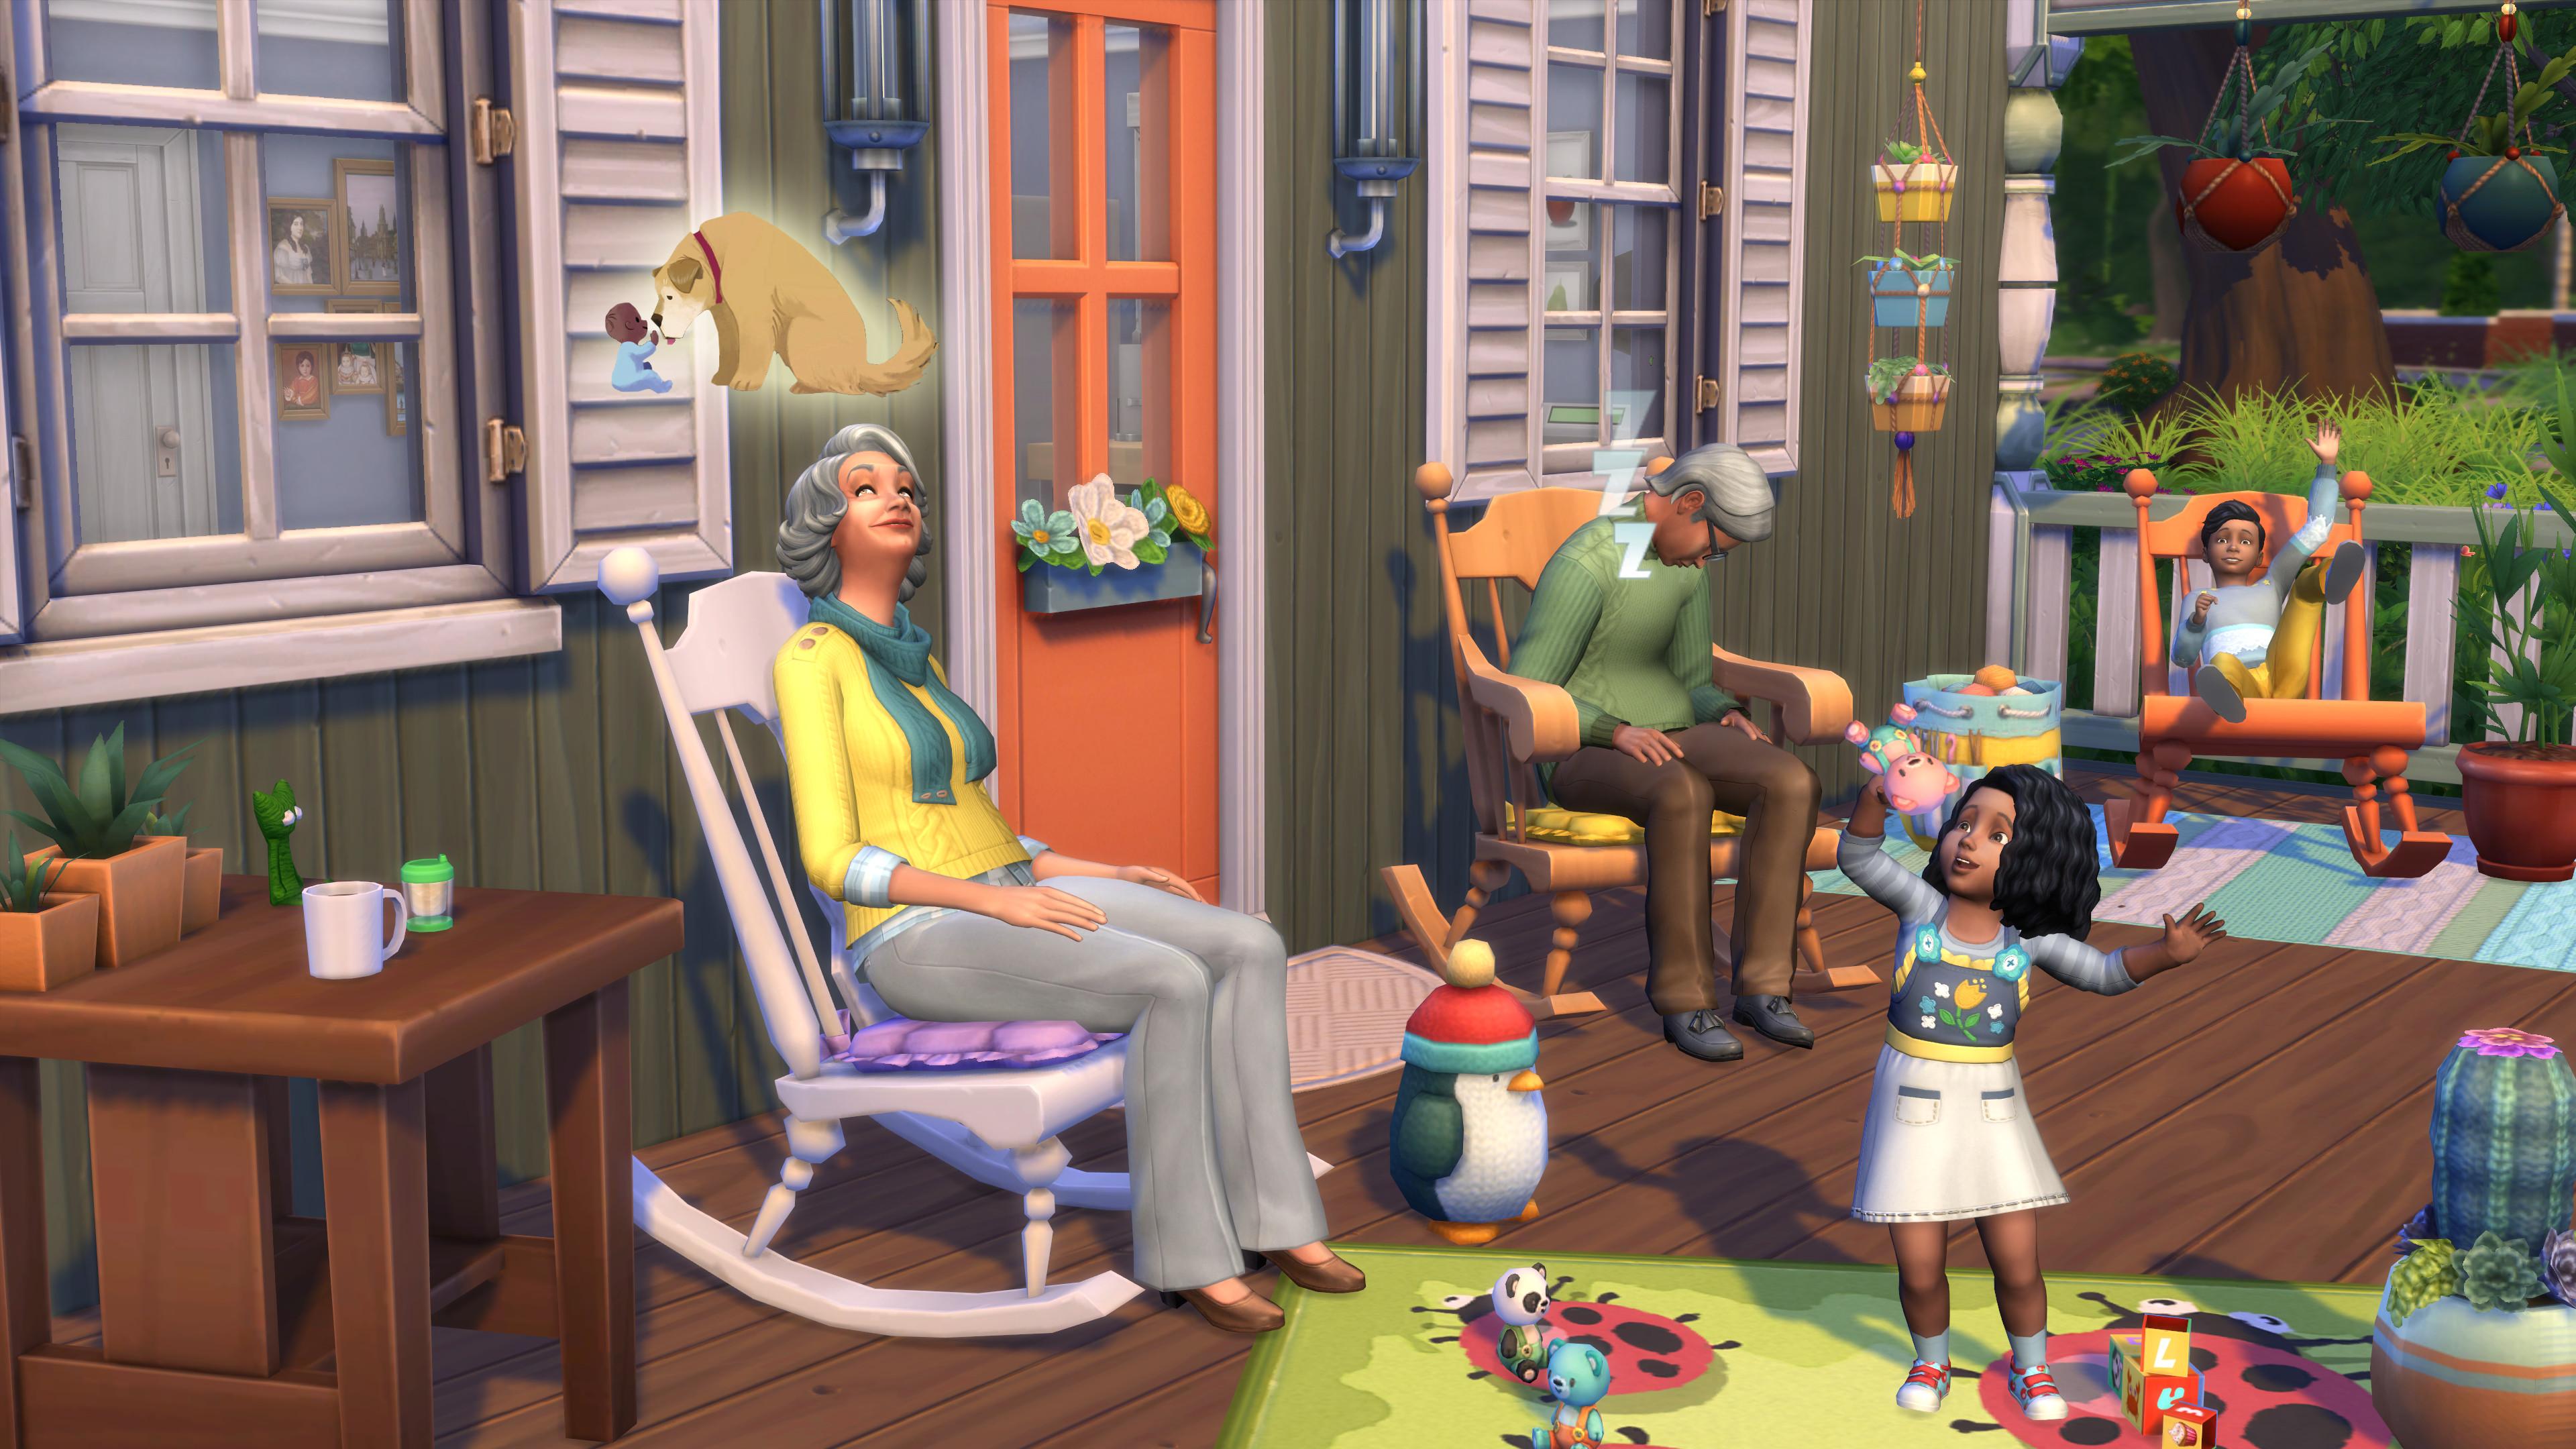 The Sims 4 Nifty Knitting Stuff Pack screenshot